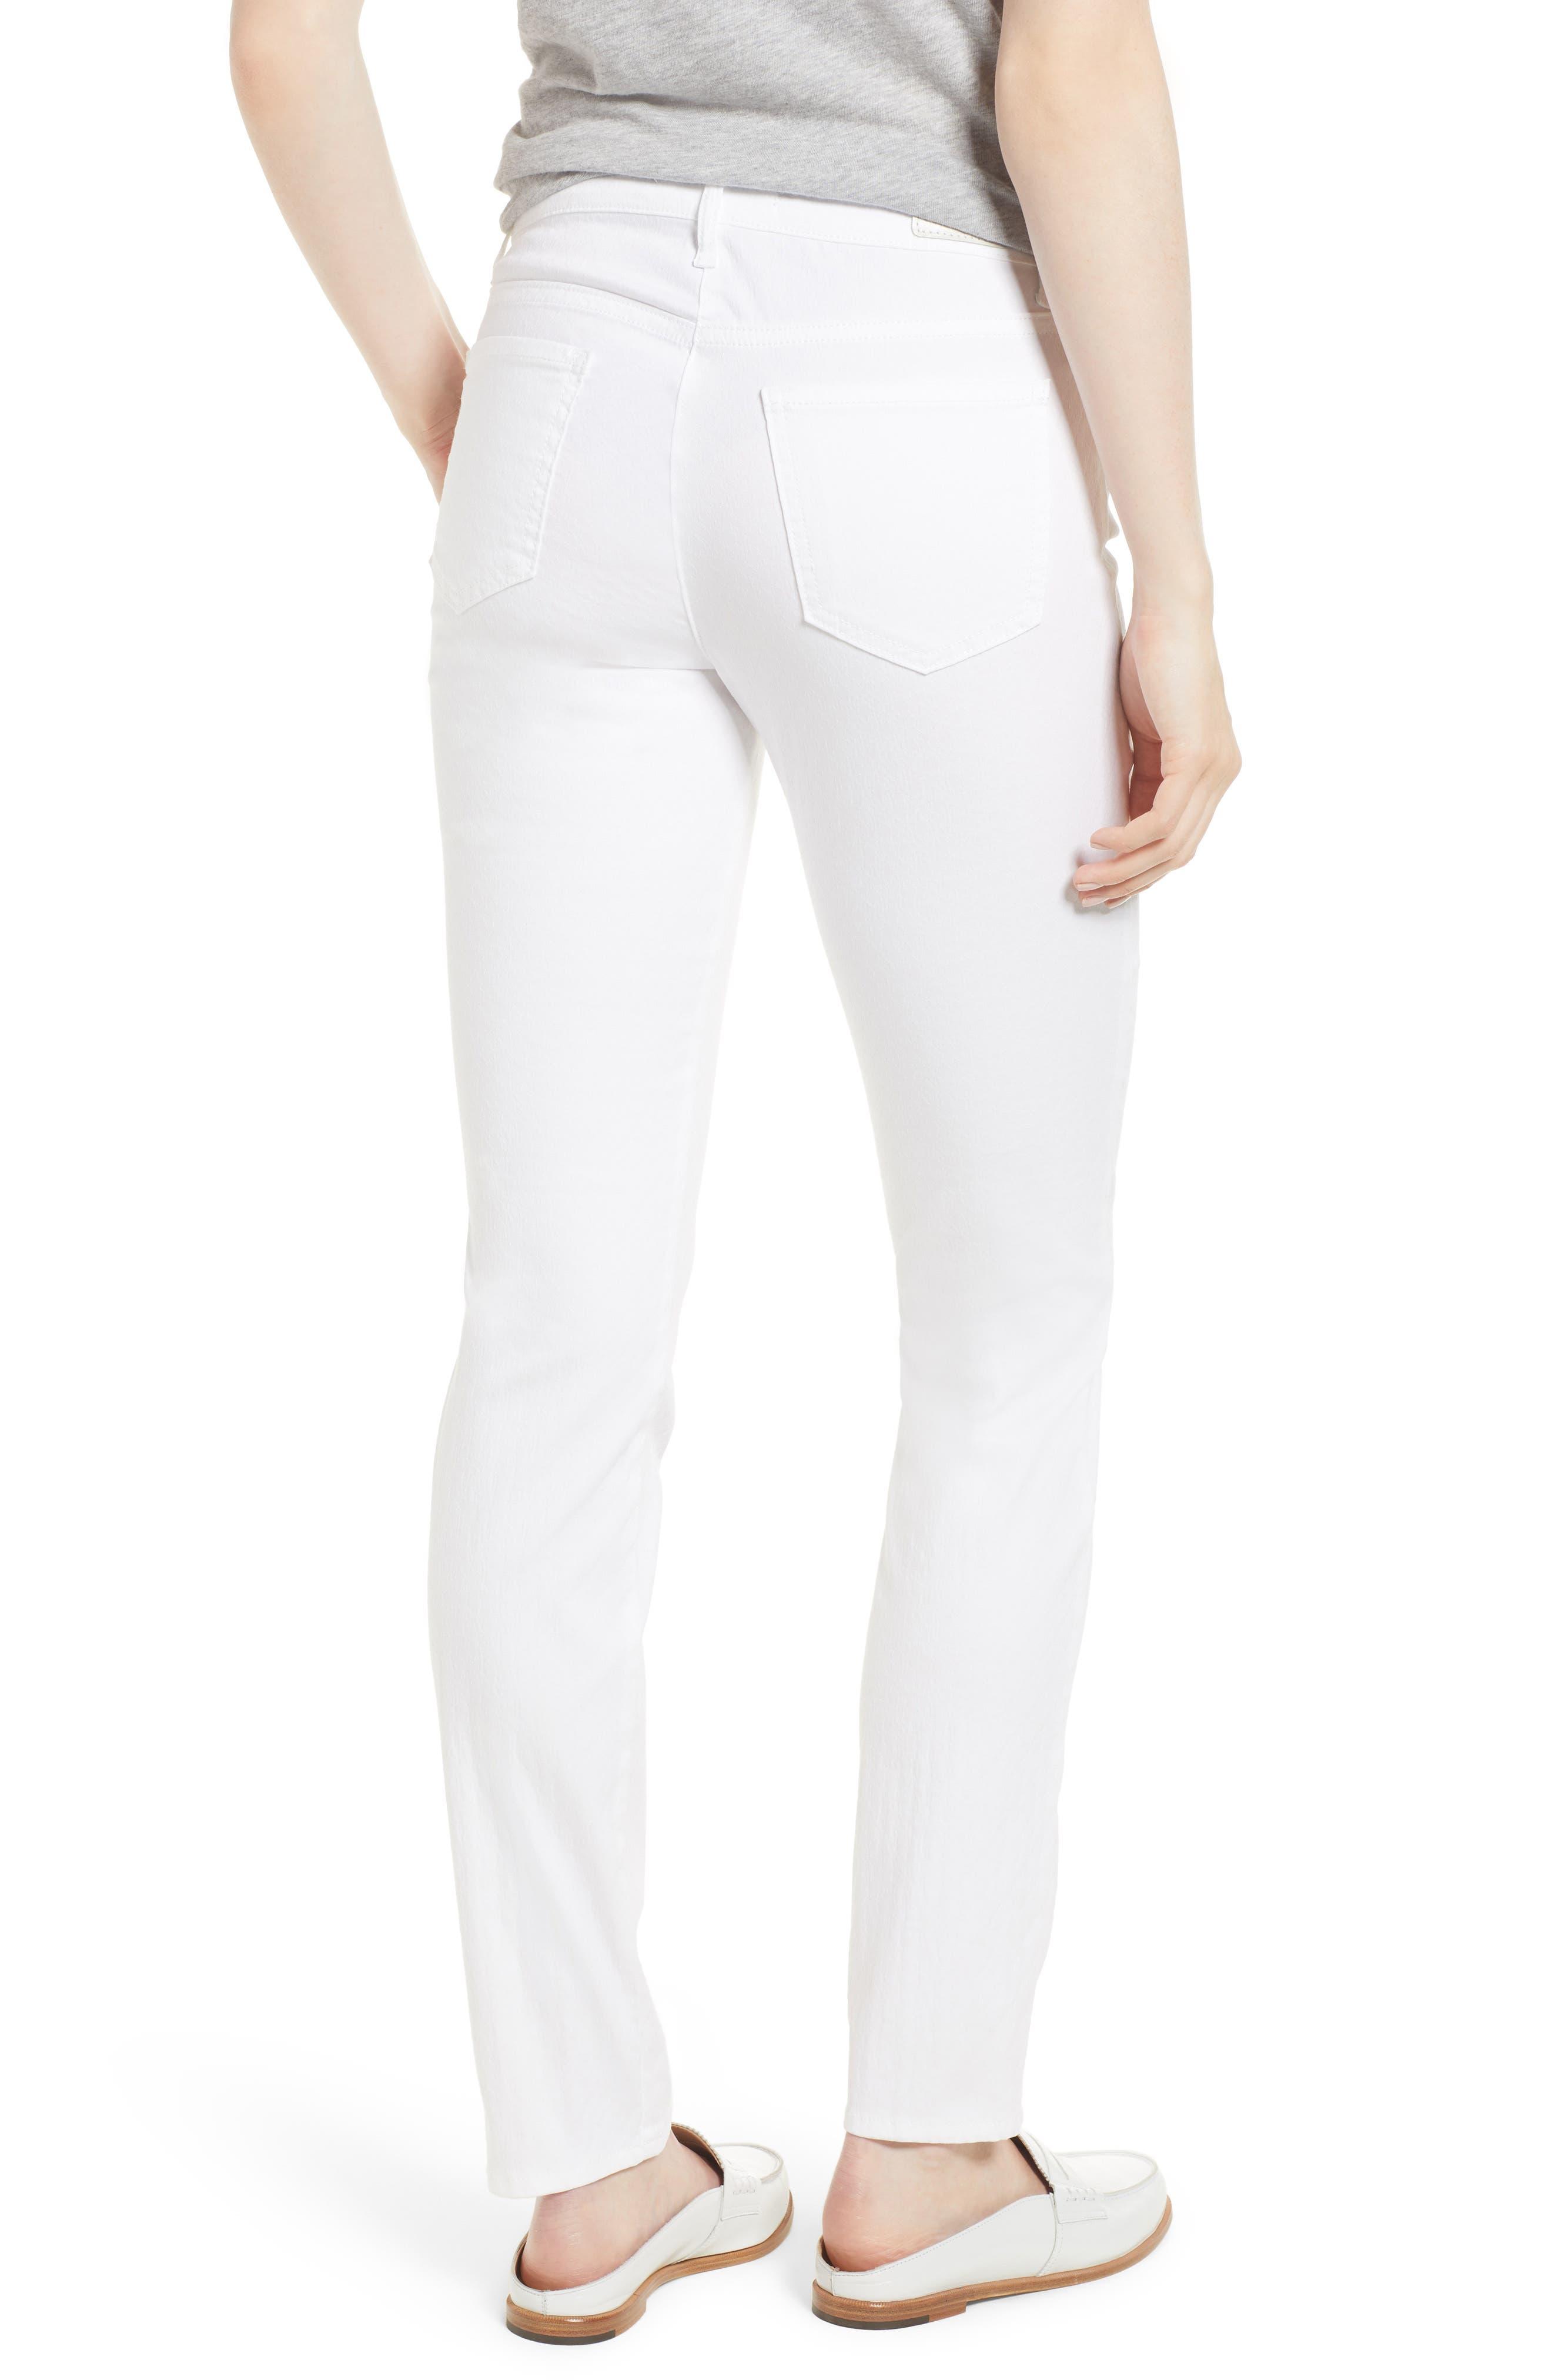 Shakira White Jeans,                             Alternate thumbnail 2, color,                             White